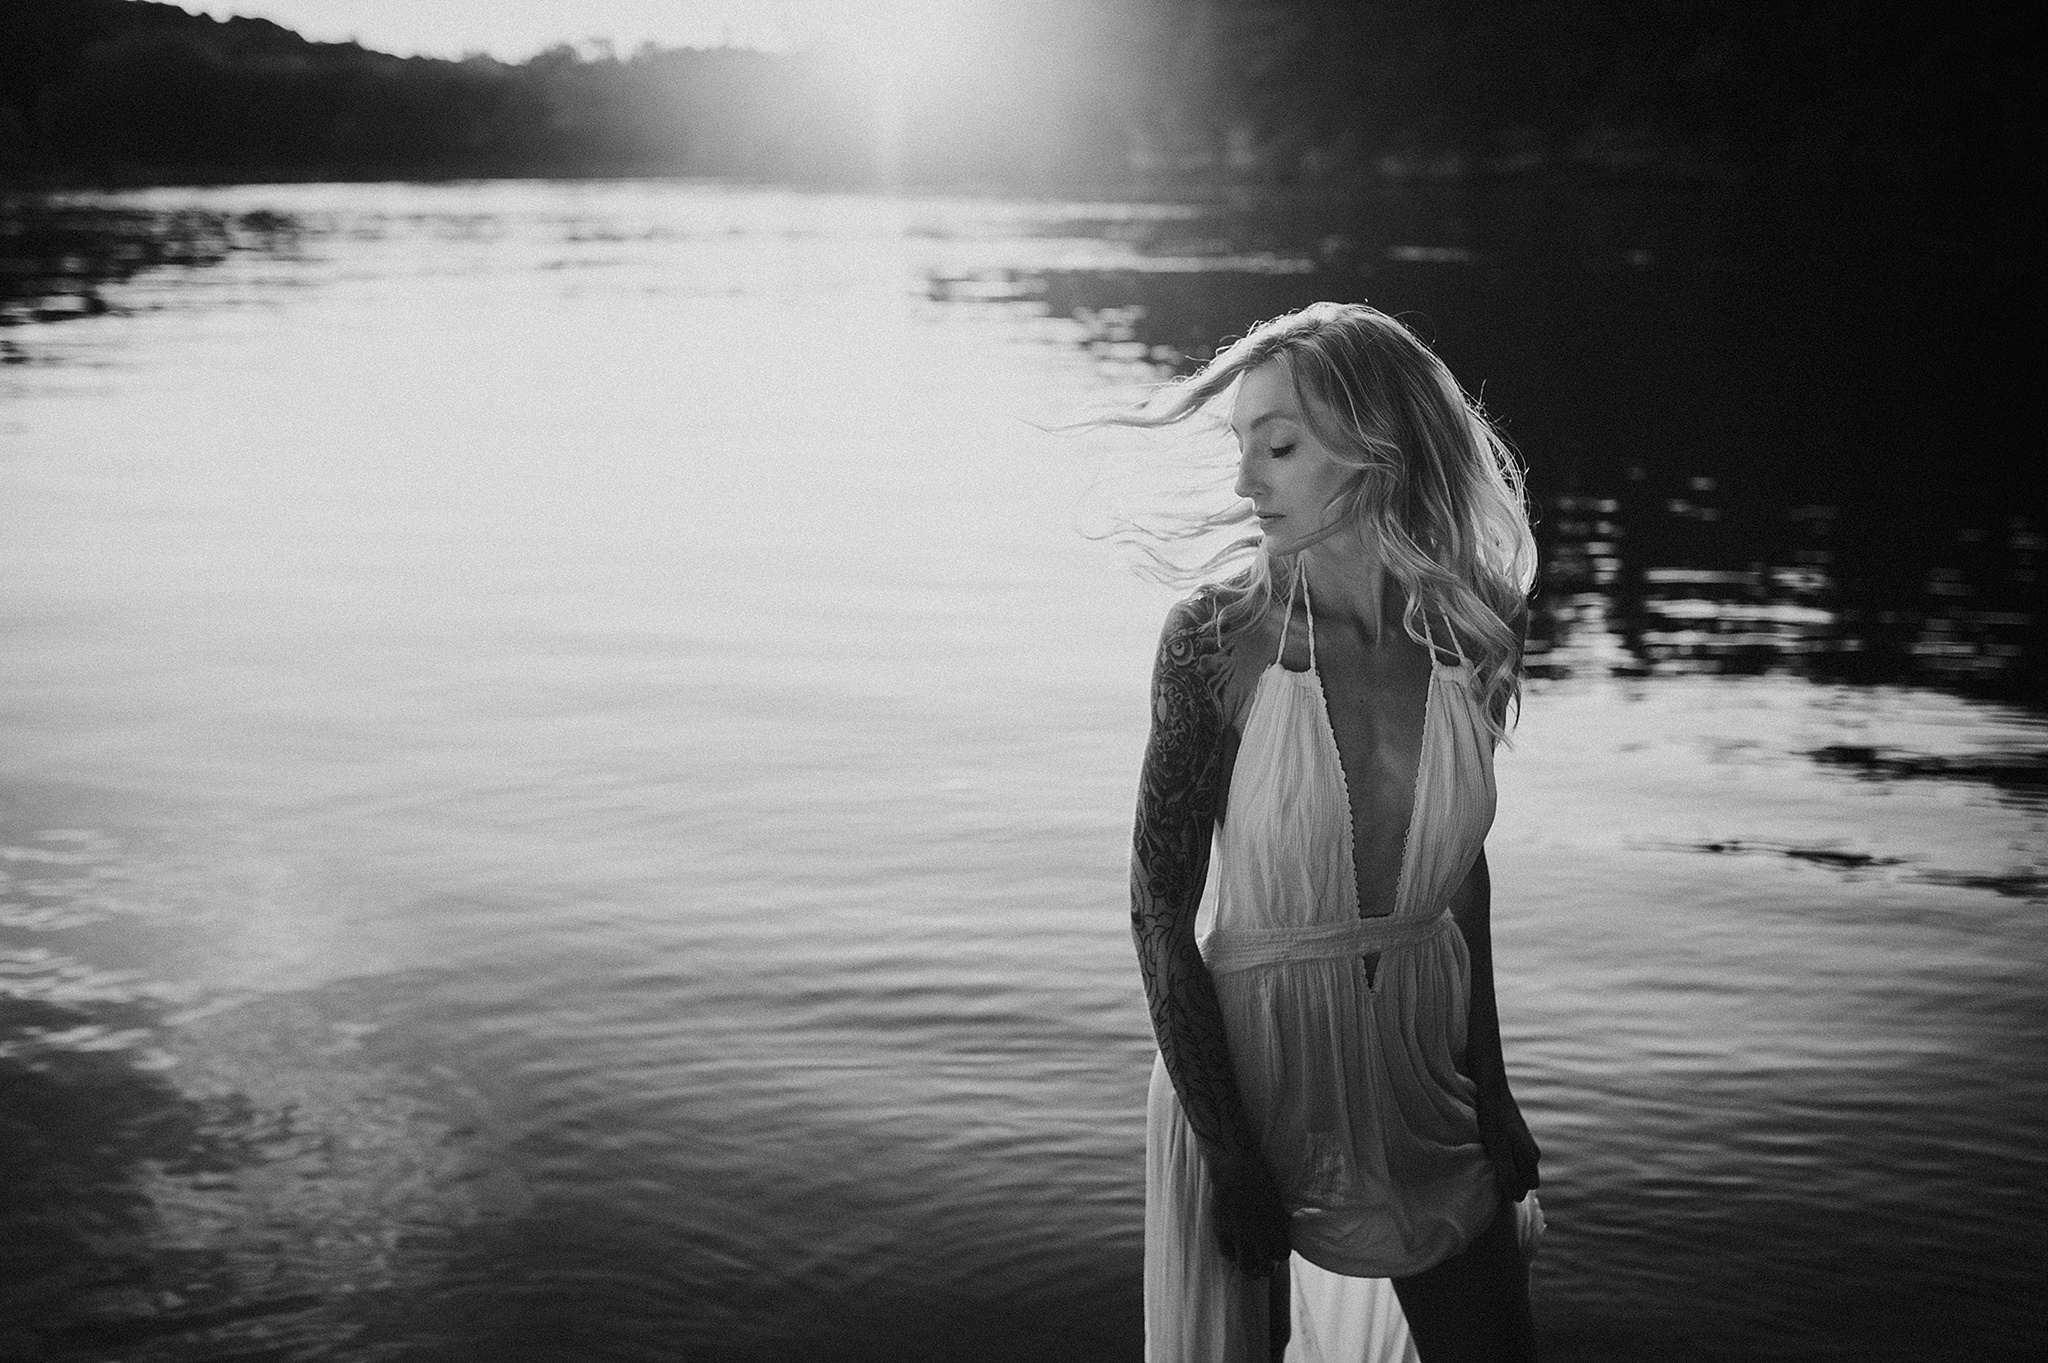 outdoor-boudoir-photographer-water_18.jpg